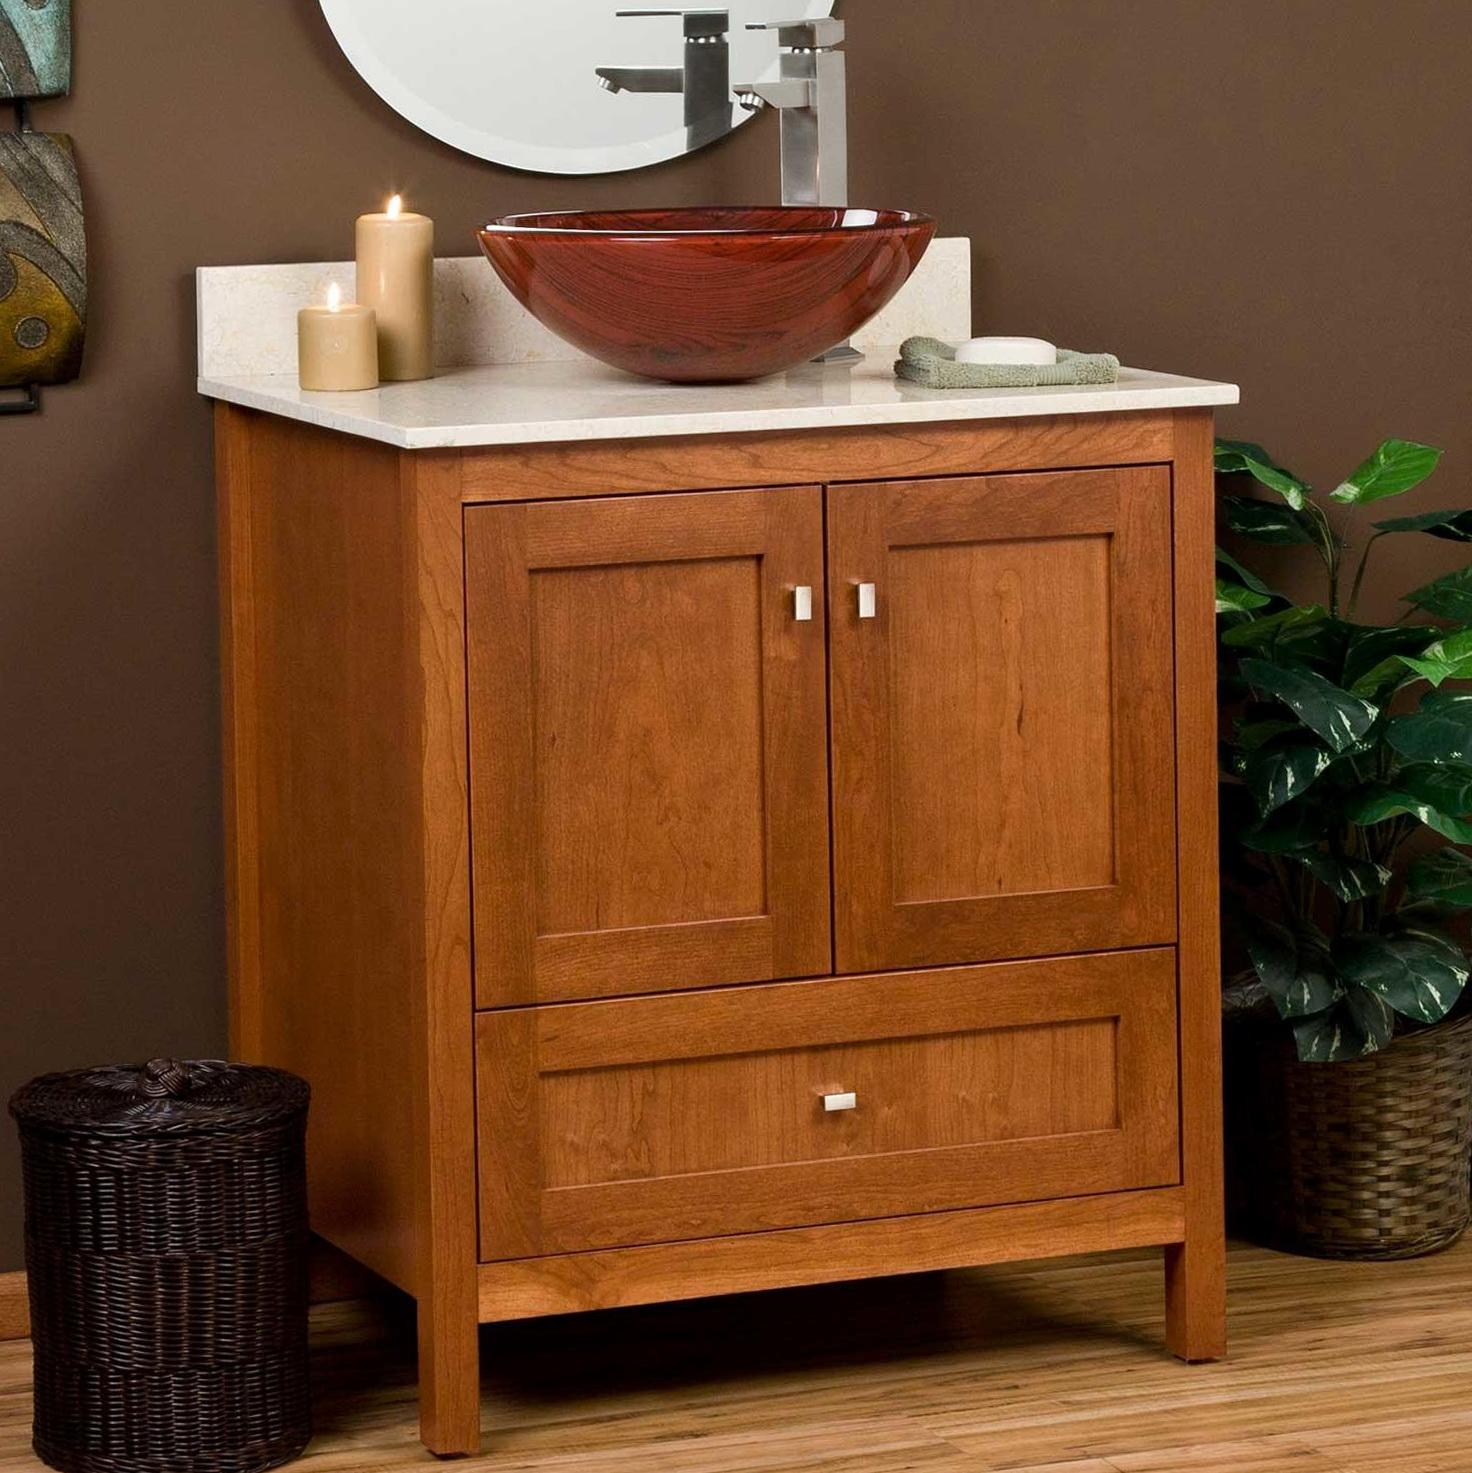 wood bathroom the vanity sinks vessel vanities ideas with collection sink home